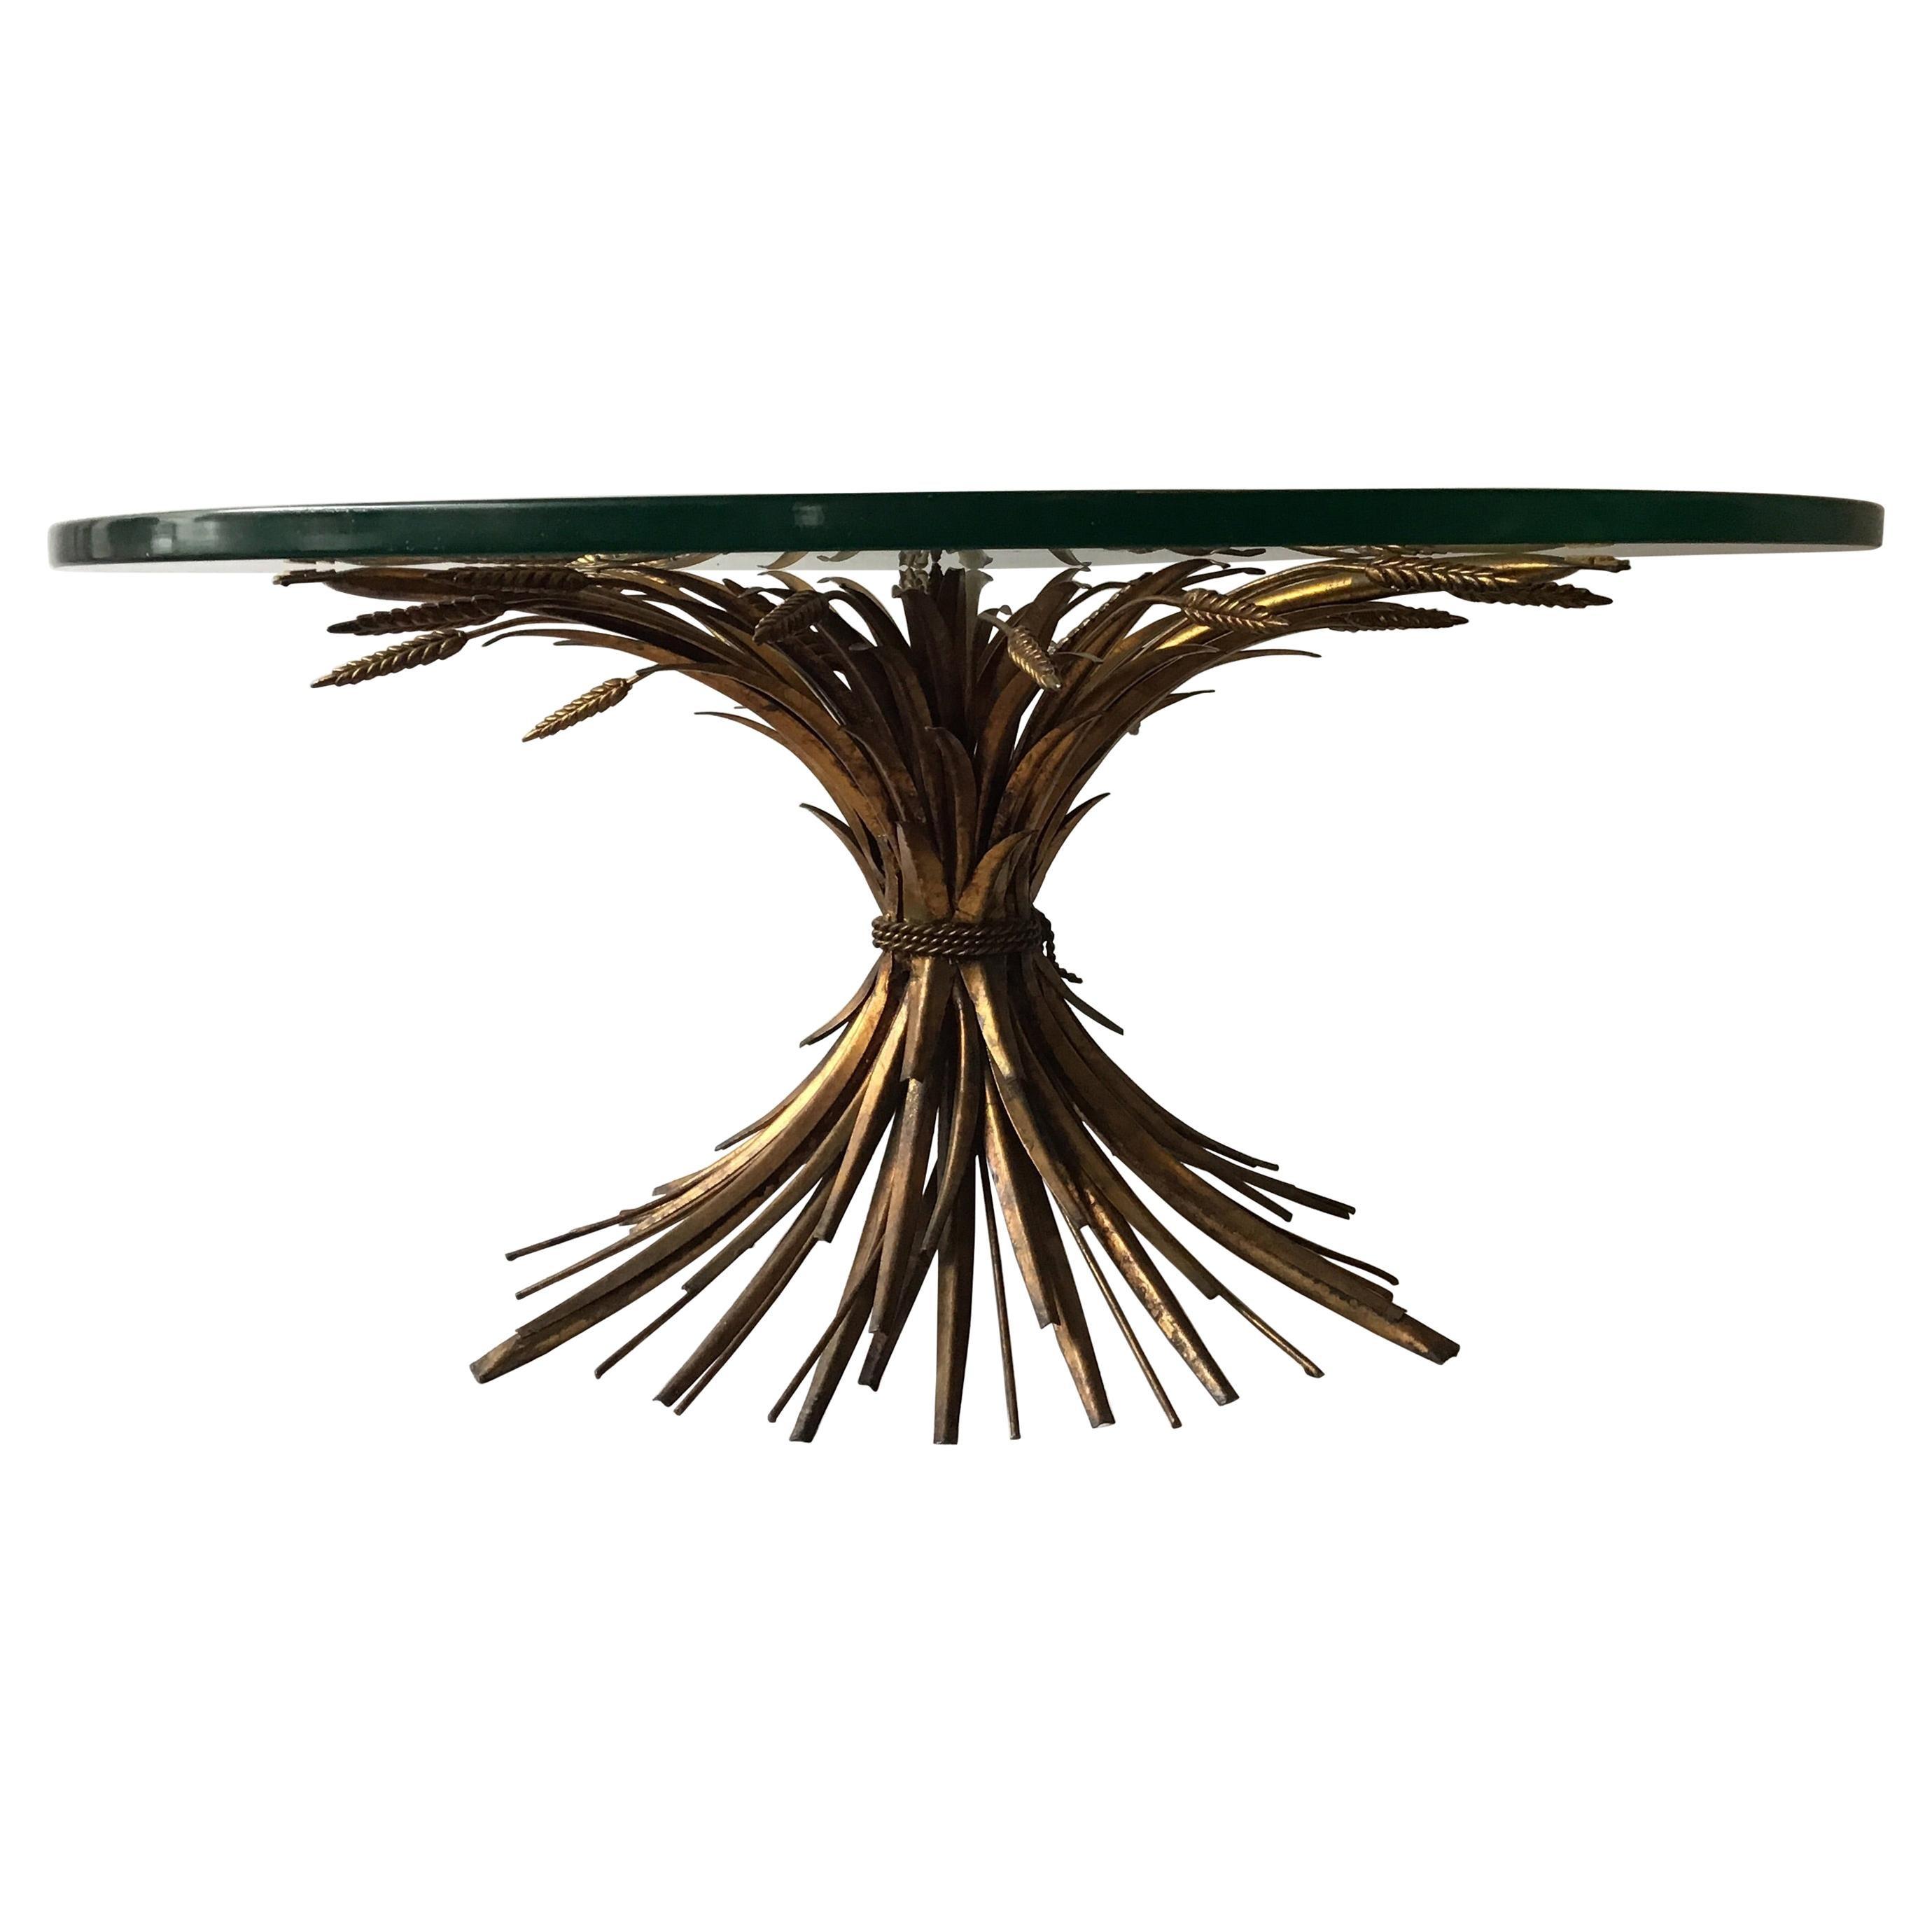 1960s Italian Sheaf of Wheat Gilt Metal Coffee Table